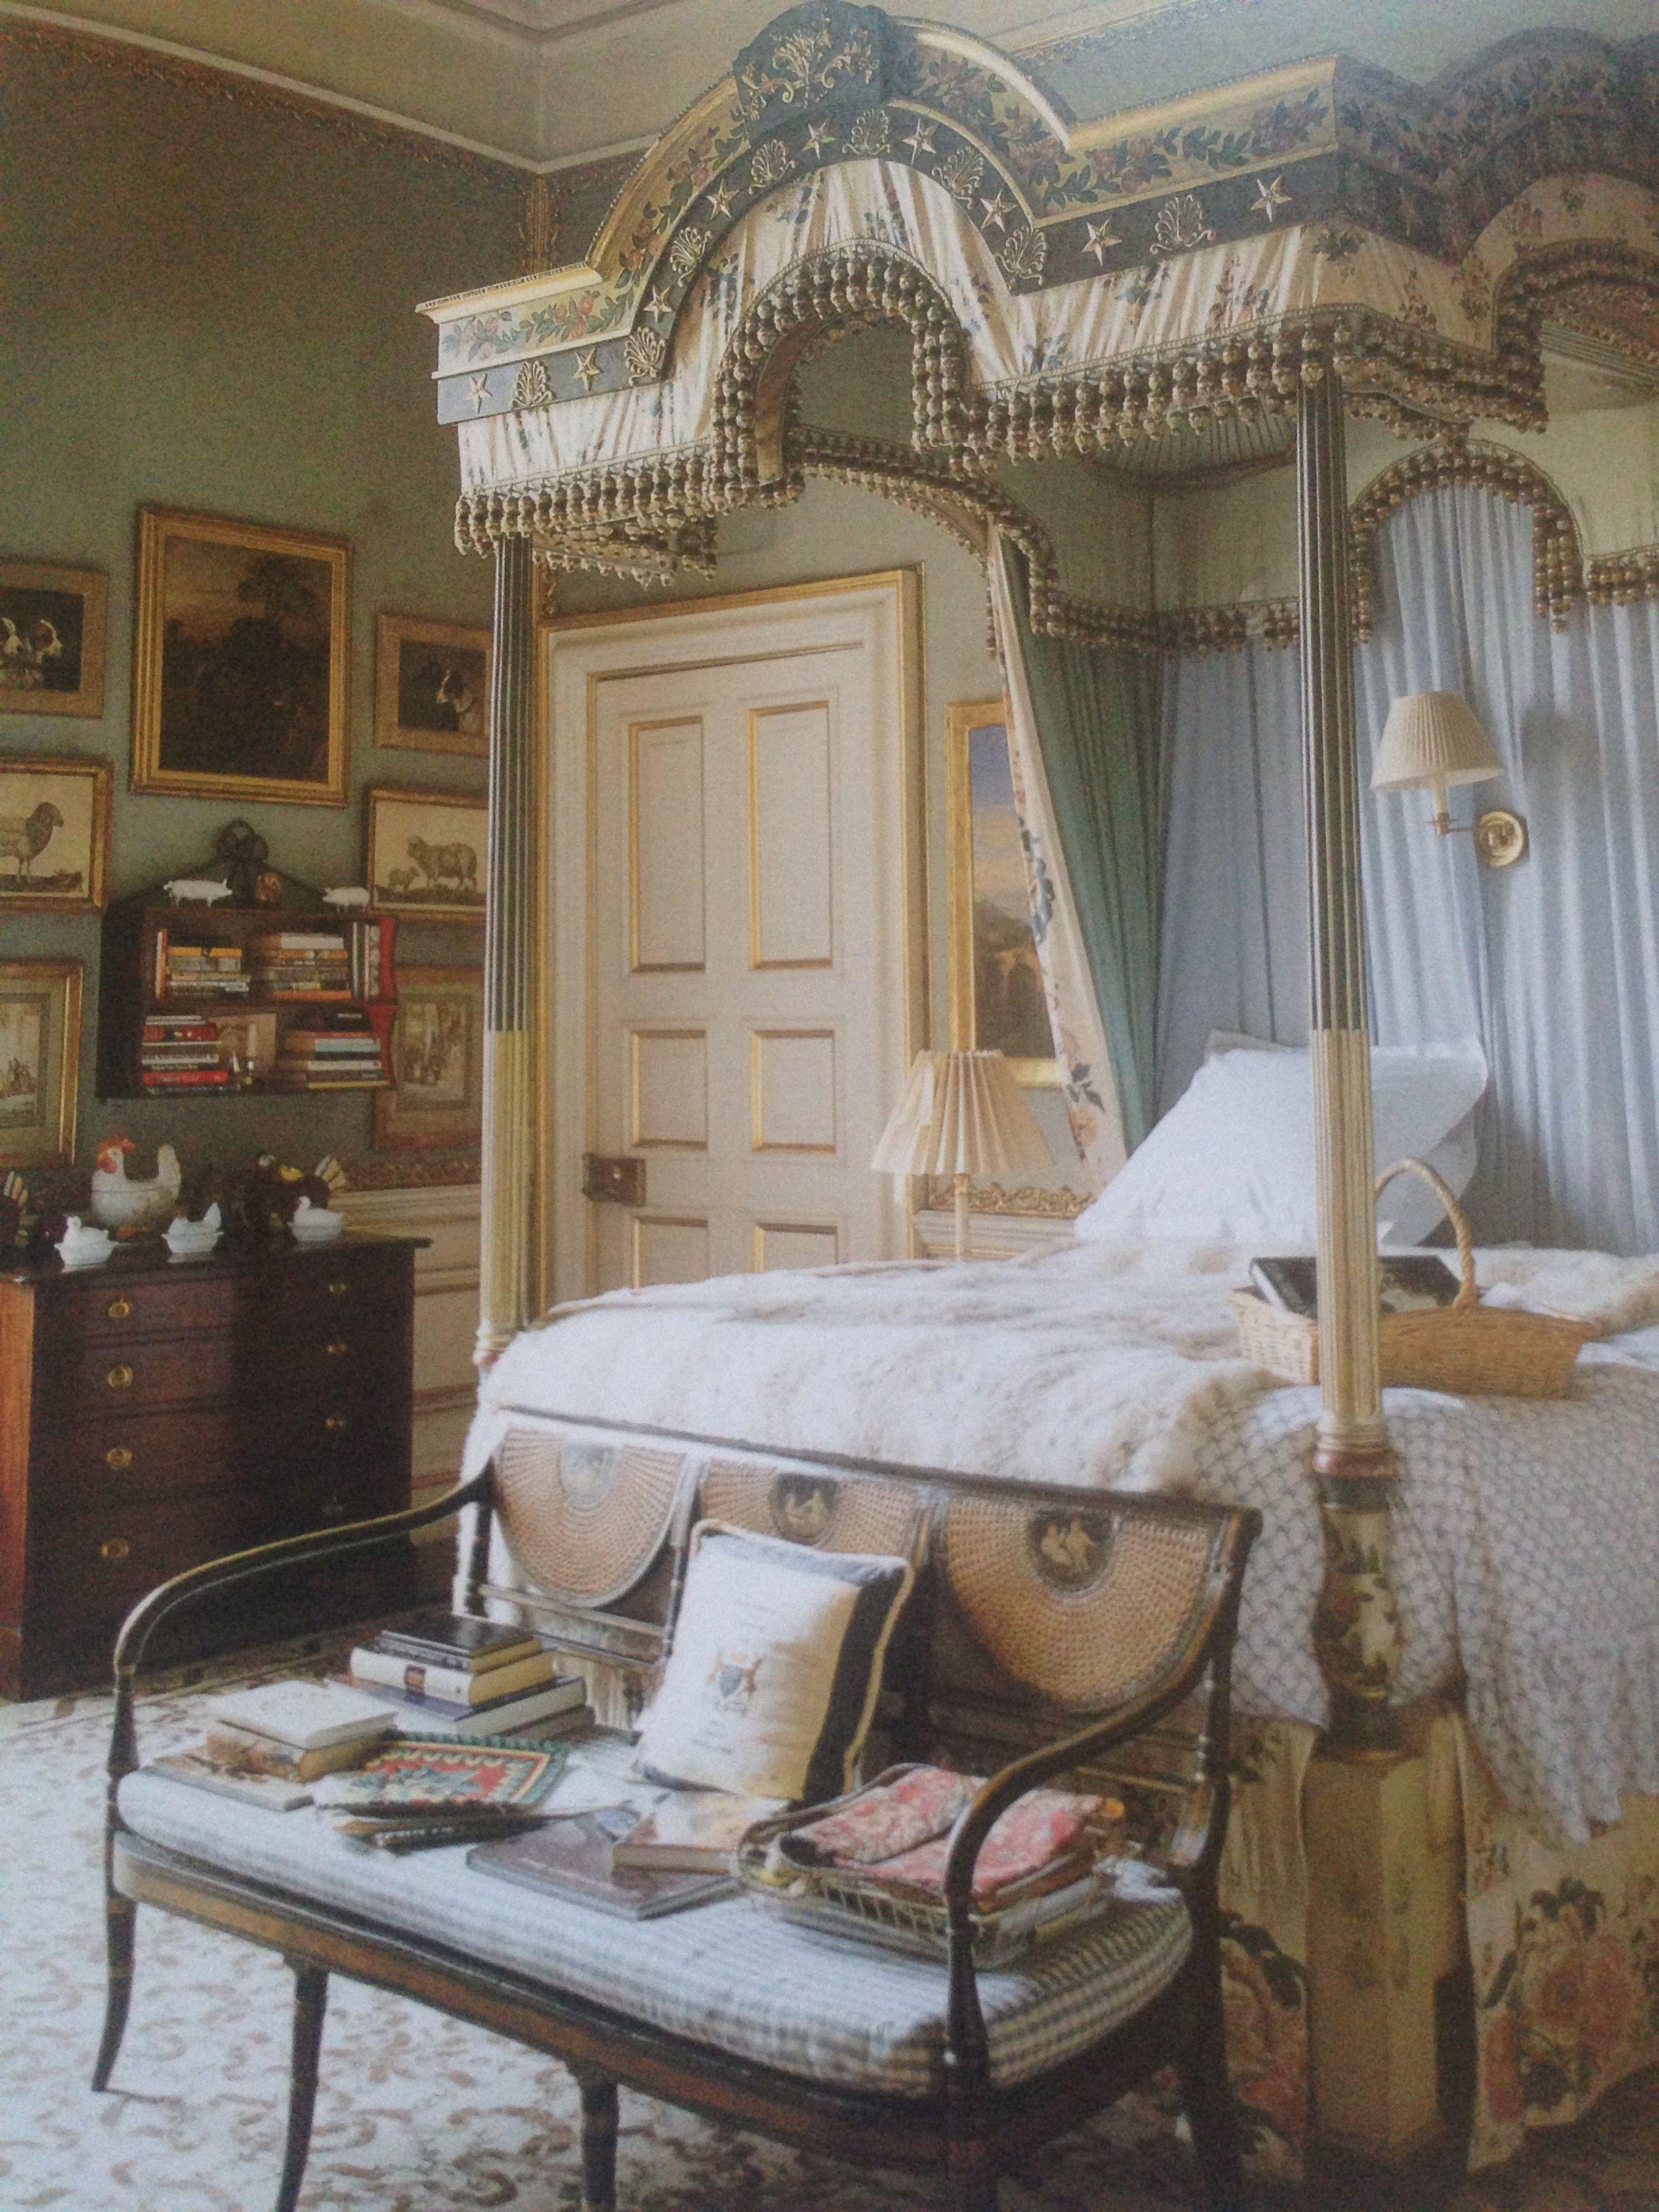 97de4e481137acf1cdb8c4c3d06a71f5 - How Much Is It To Get Into Chatsworth House